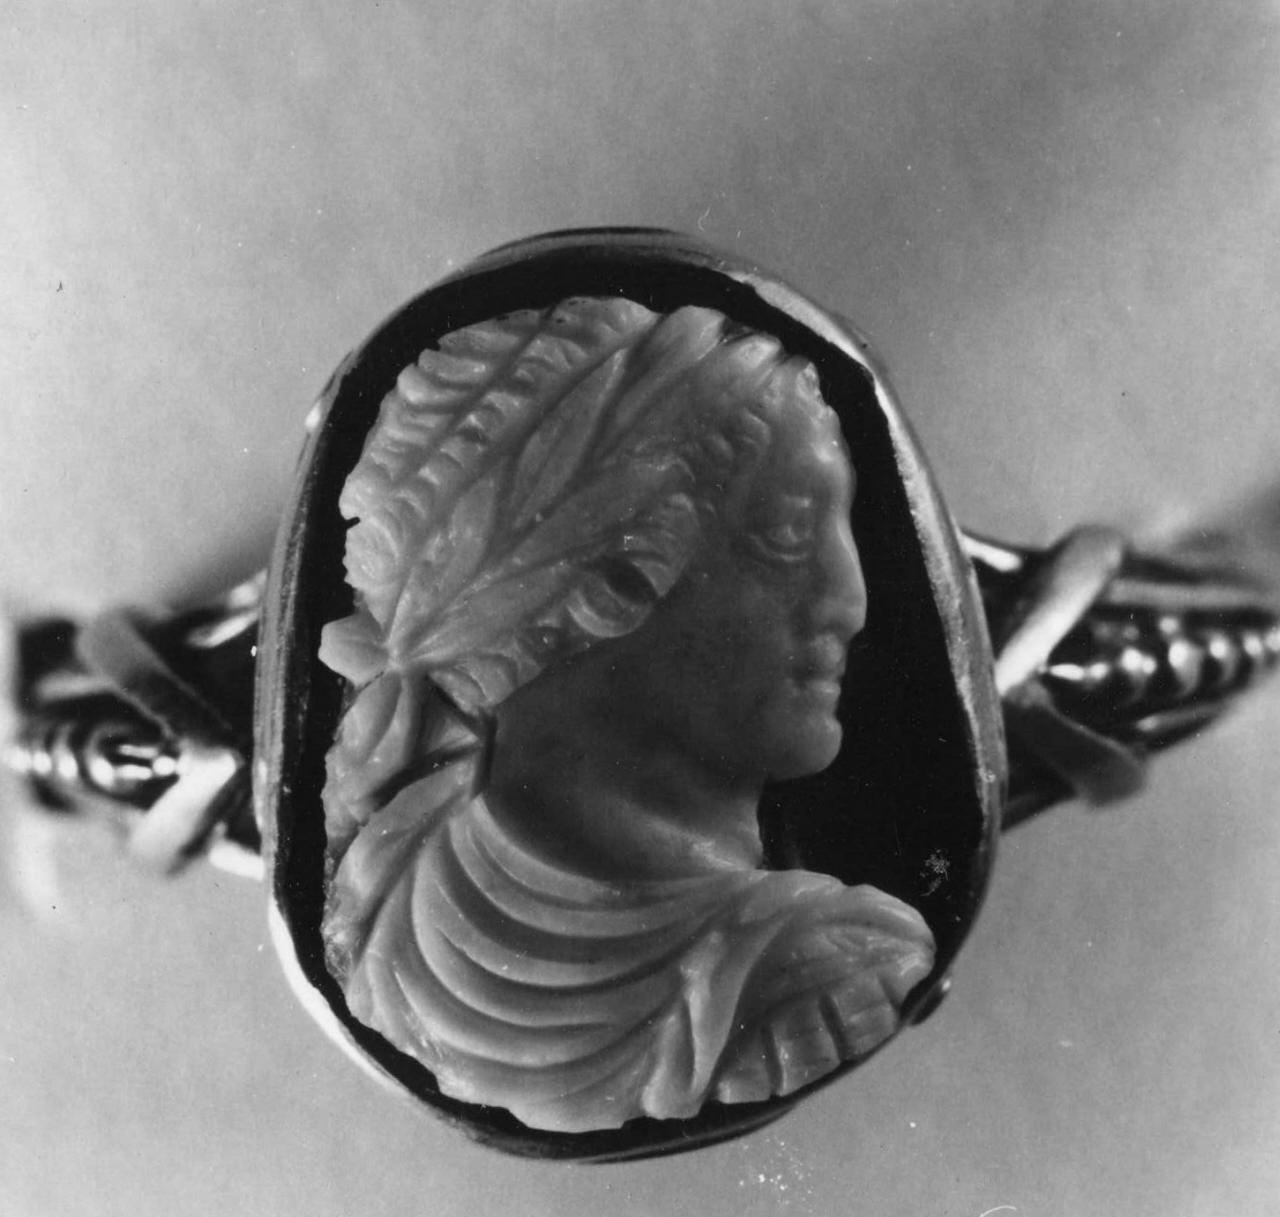 busto di Eliogabalo (cammeo) - bottega italiana (sec. XVI)